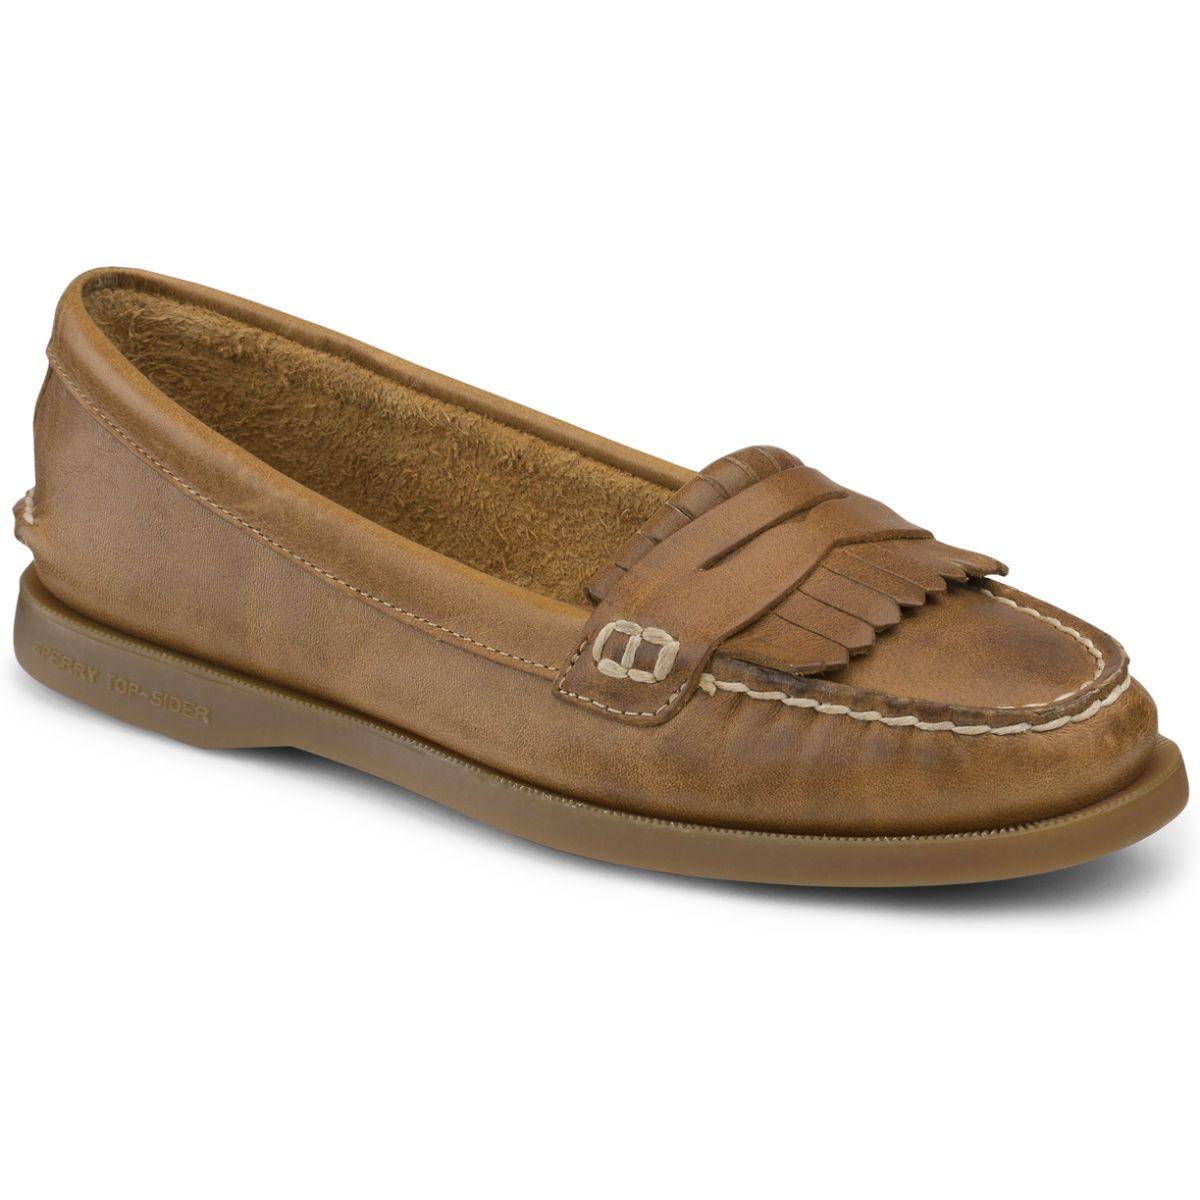 Sperry Top-Sider - Women's Avery Slip On Loafer. Boat ShoesWomen's ...